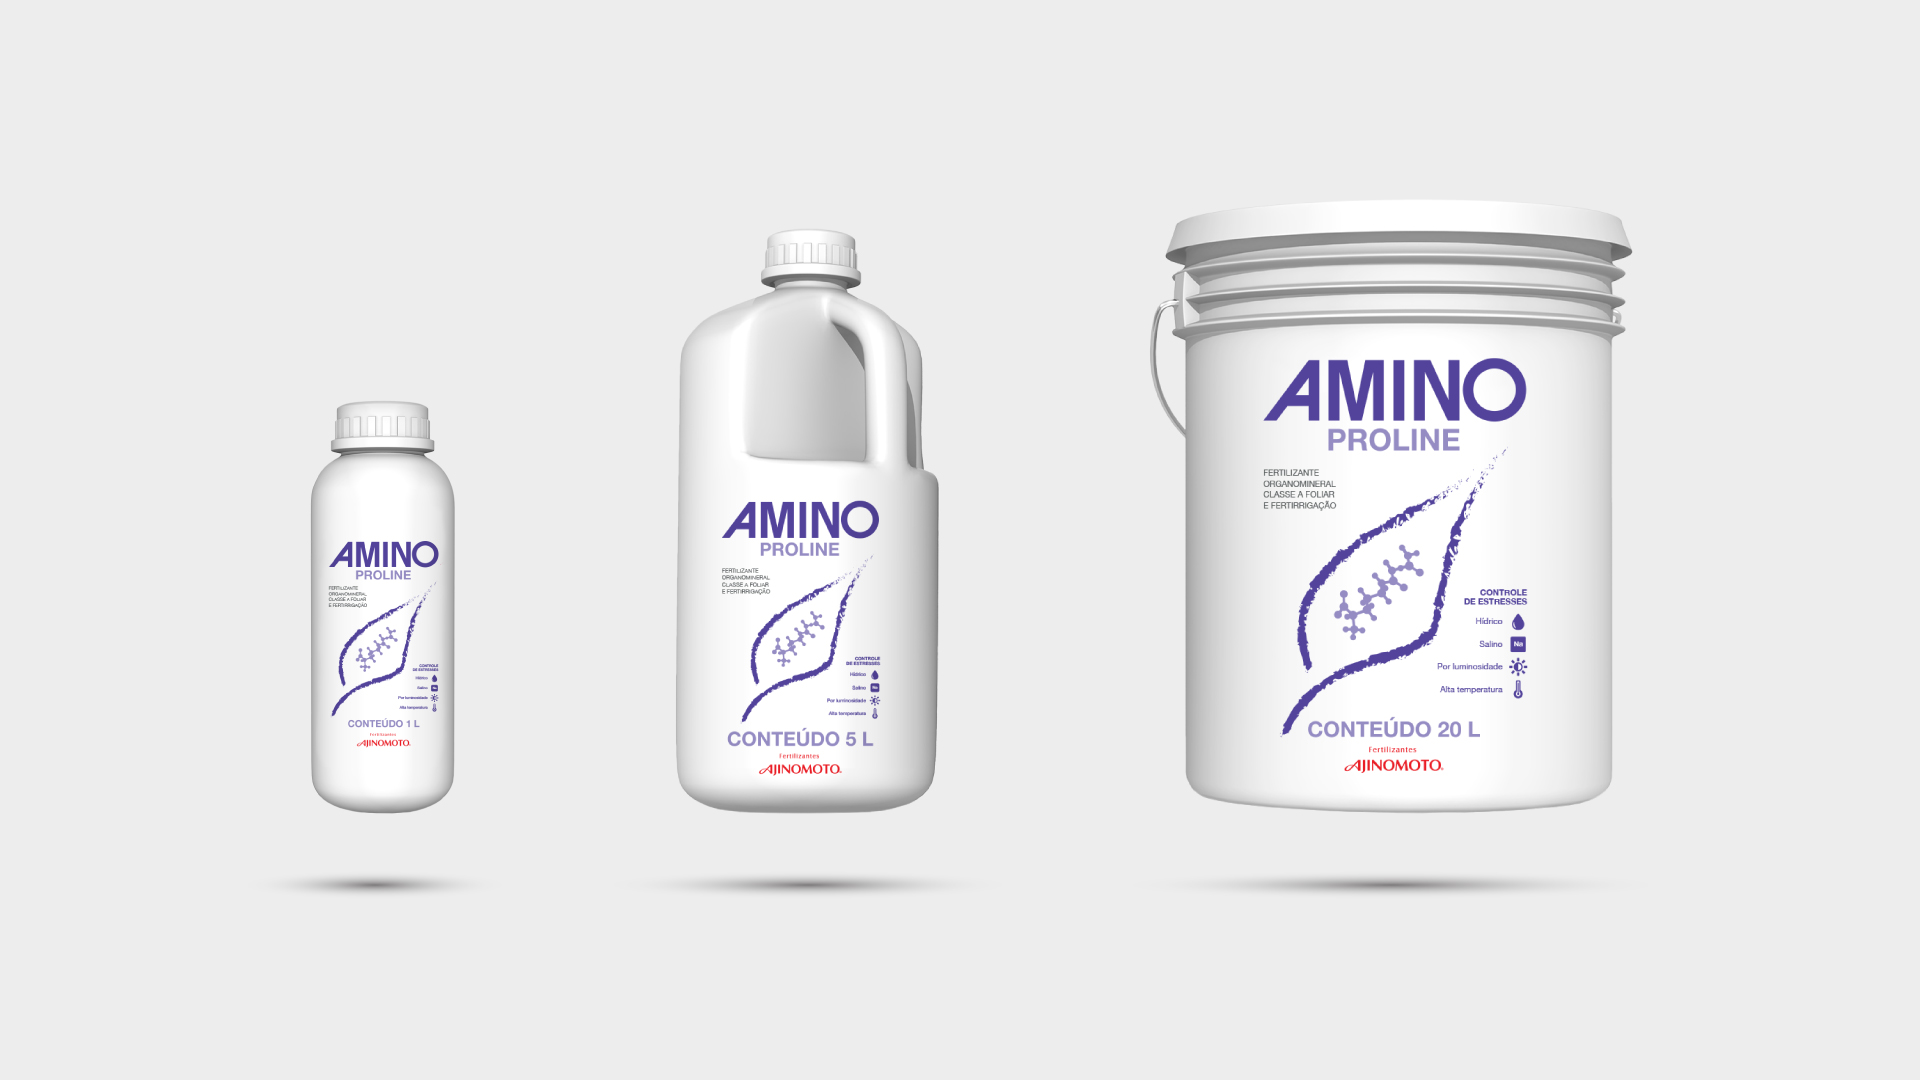 produto-amino-proline.jpg